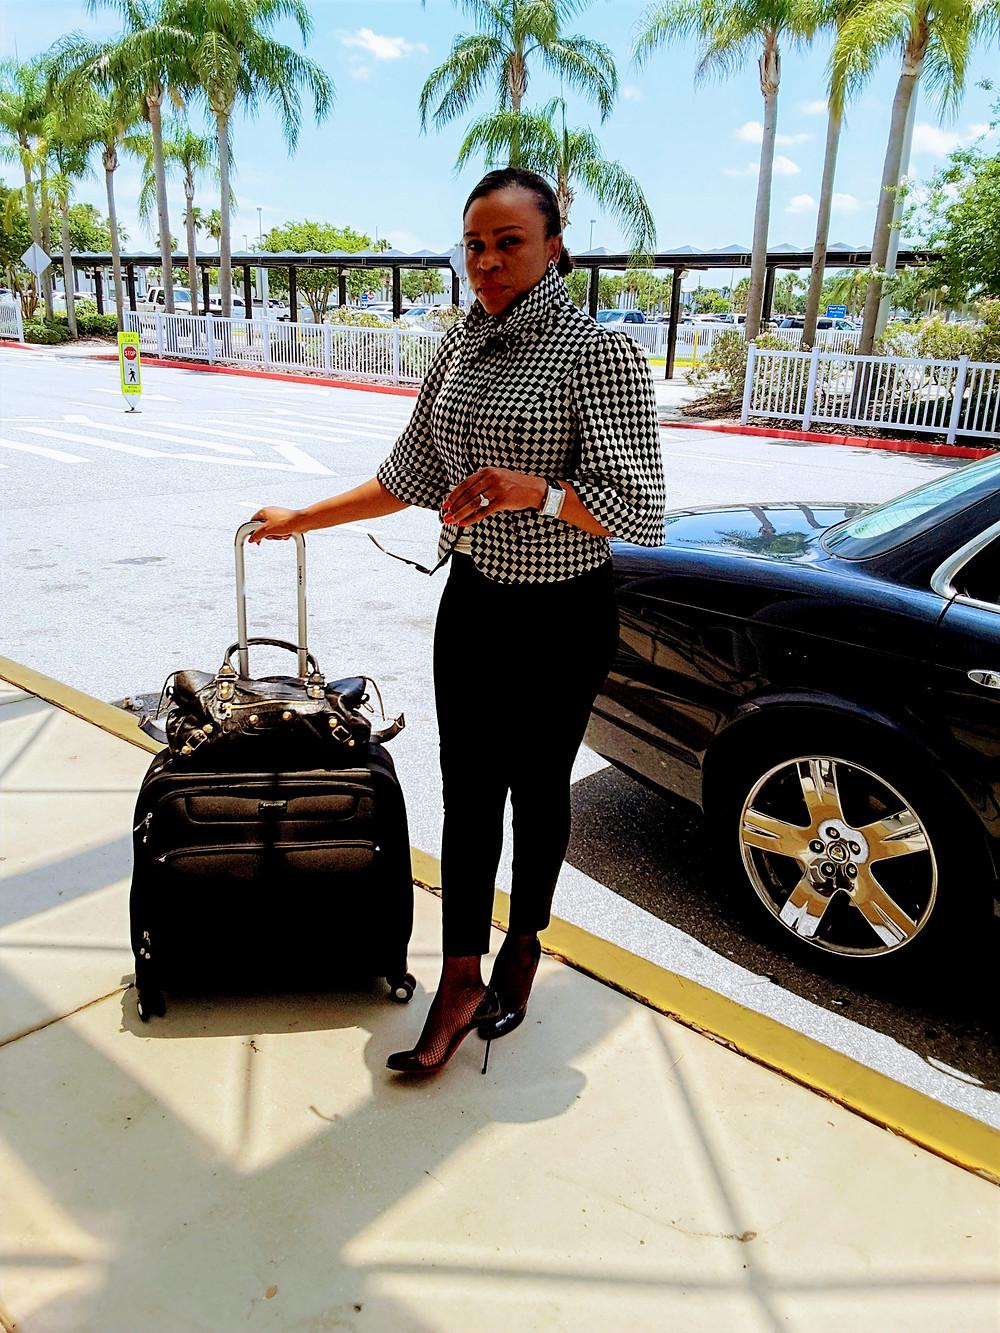 LongChamp Luggage & Samsonite